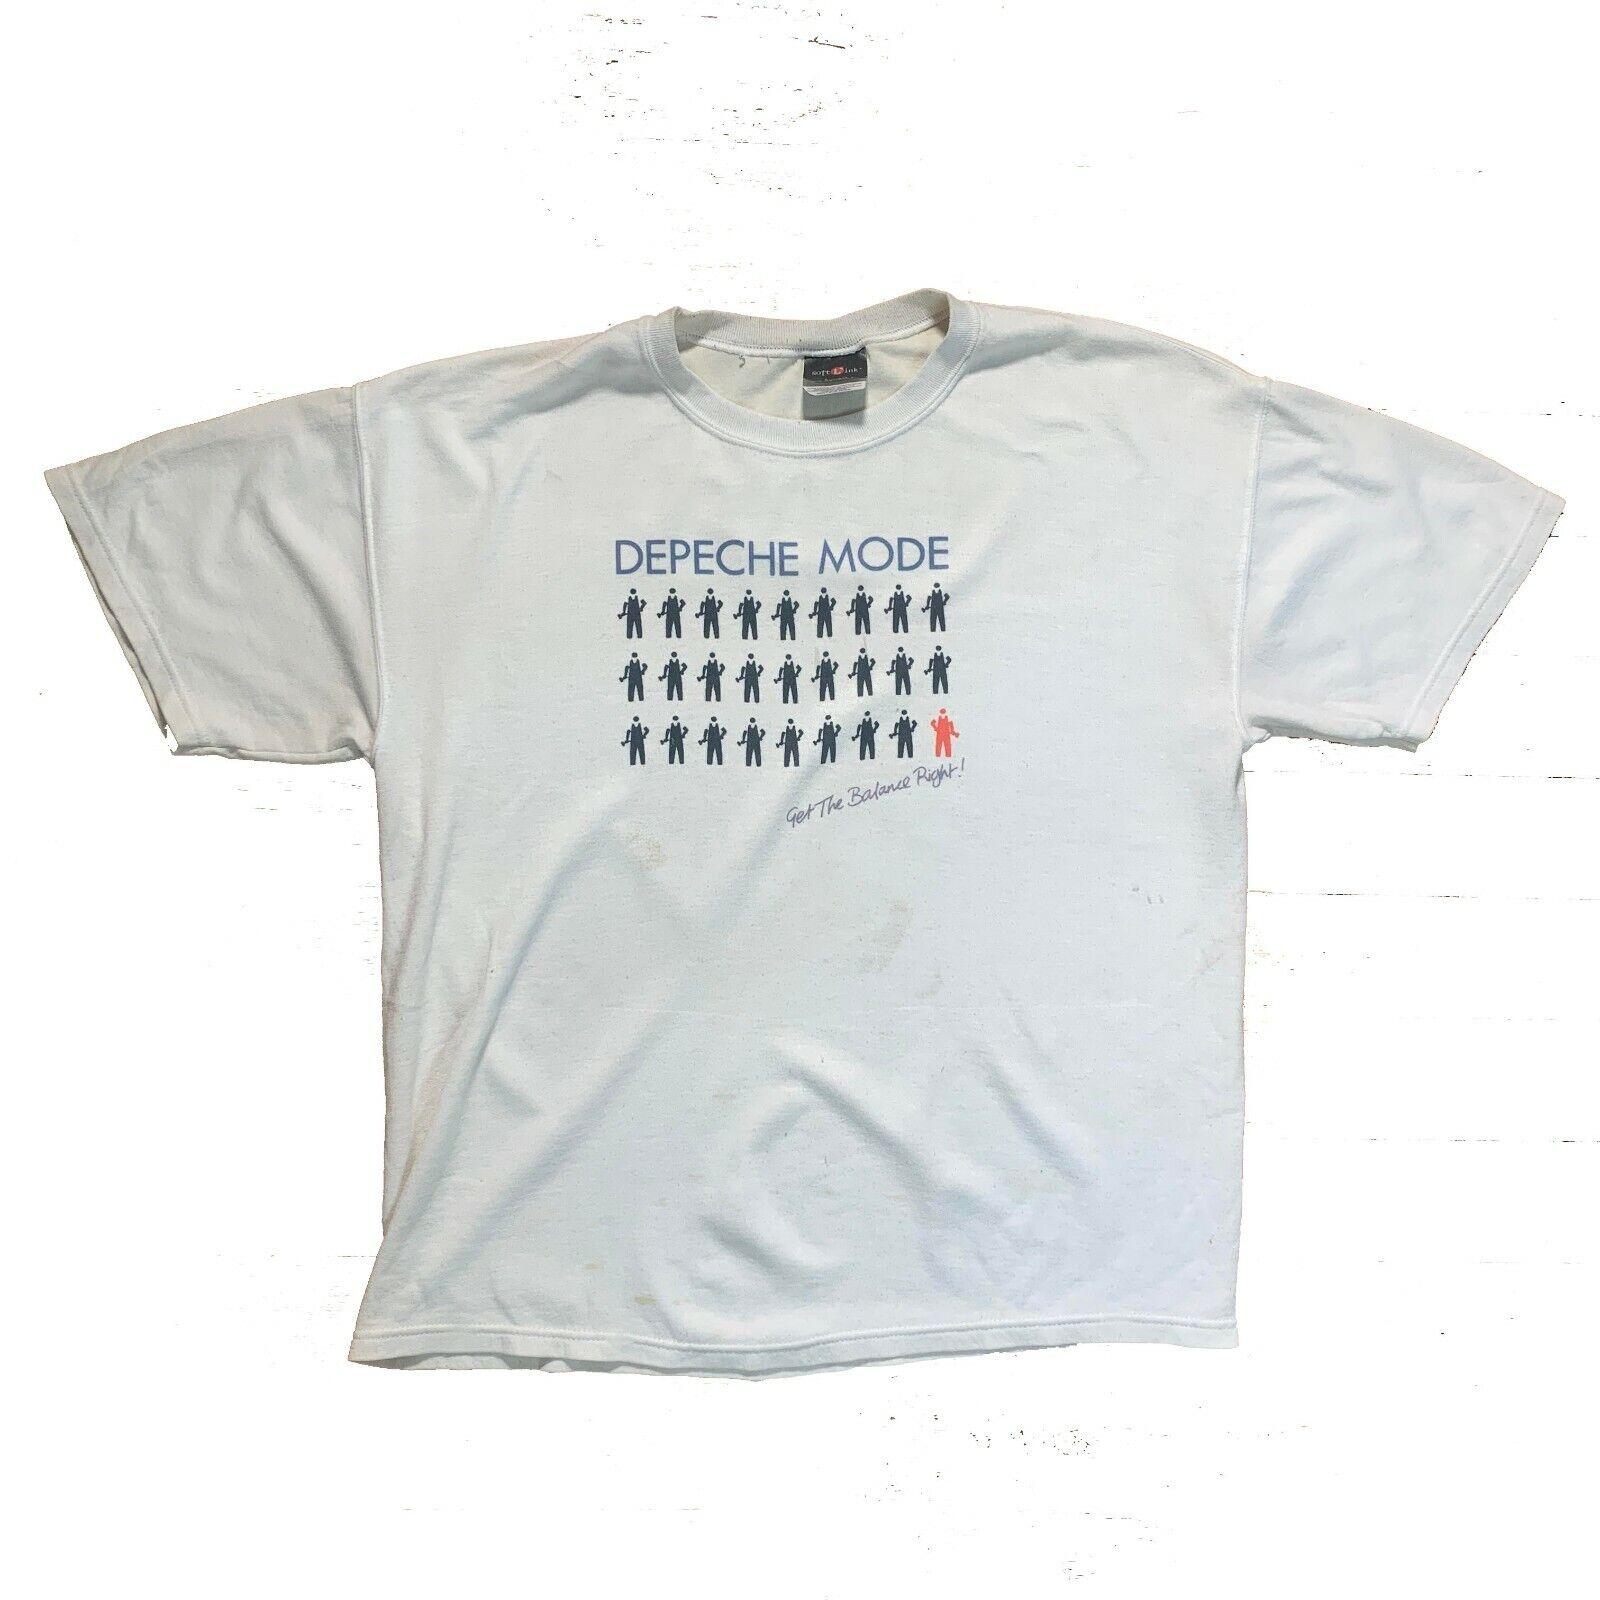 Vintage 00s Depeche Mode Get The Balance Right T-Shirt